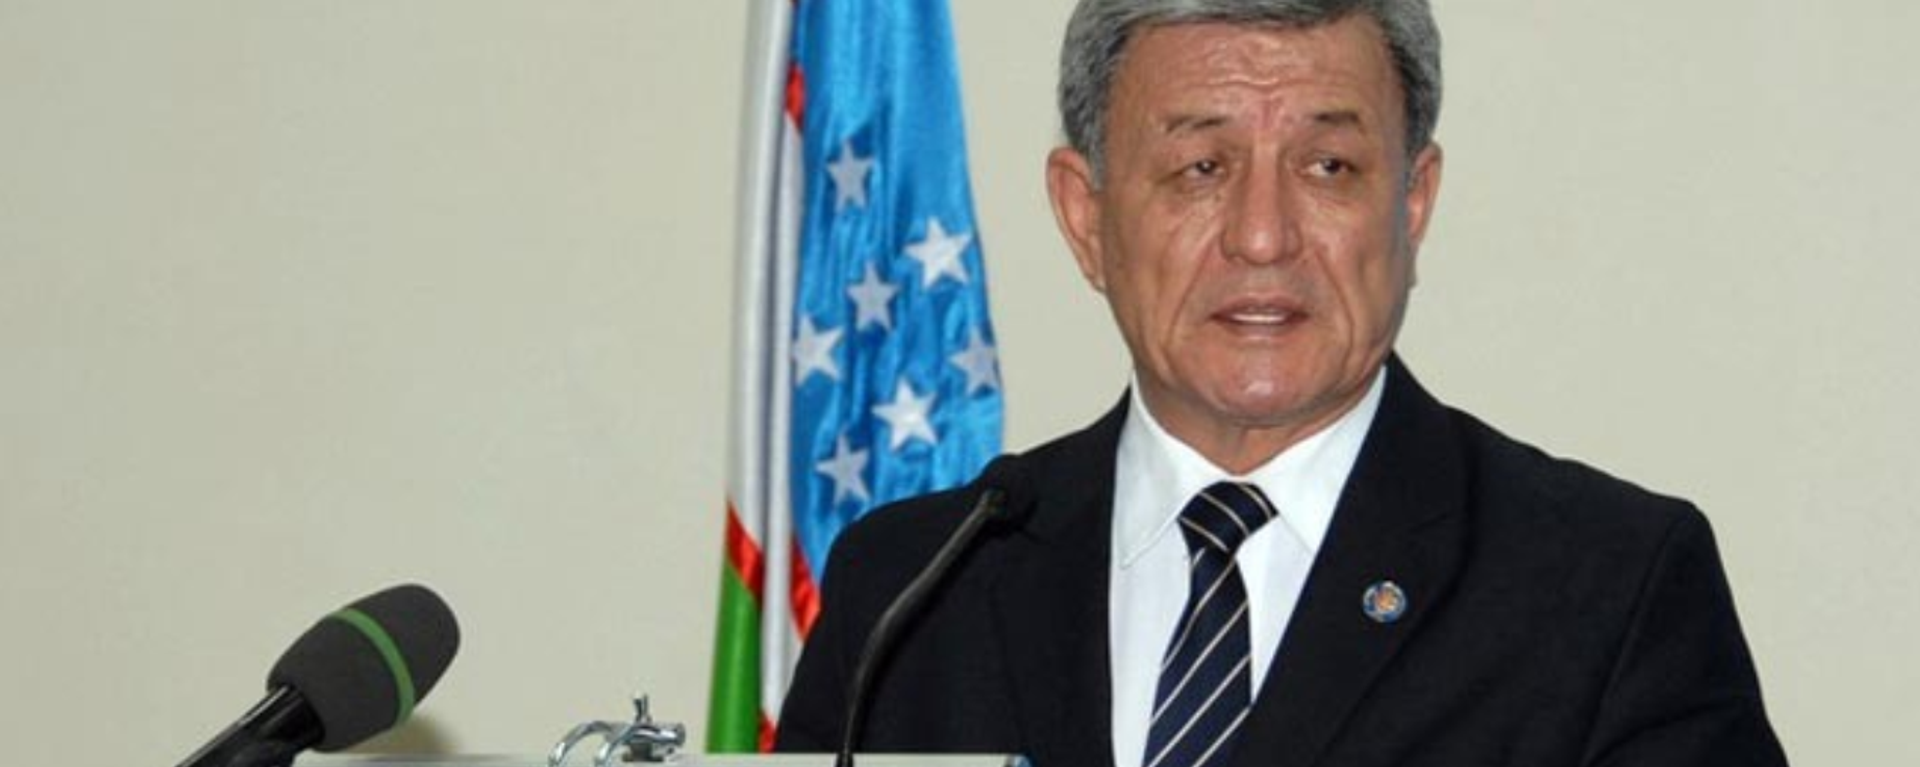 Кандидат в президенты Узбекистана от партии Адолат Нариман Умаров - Sputnik Узбекистан, 1920, 02.11.2016